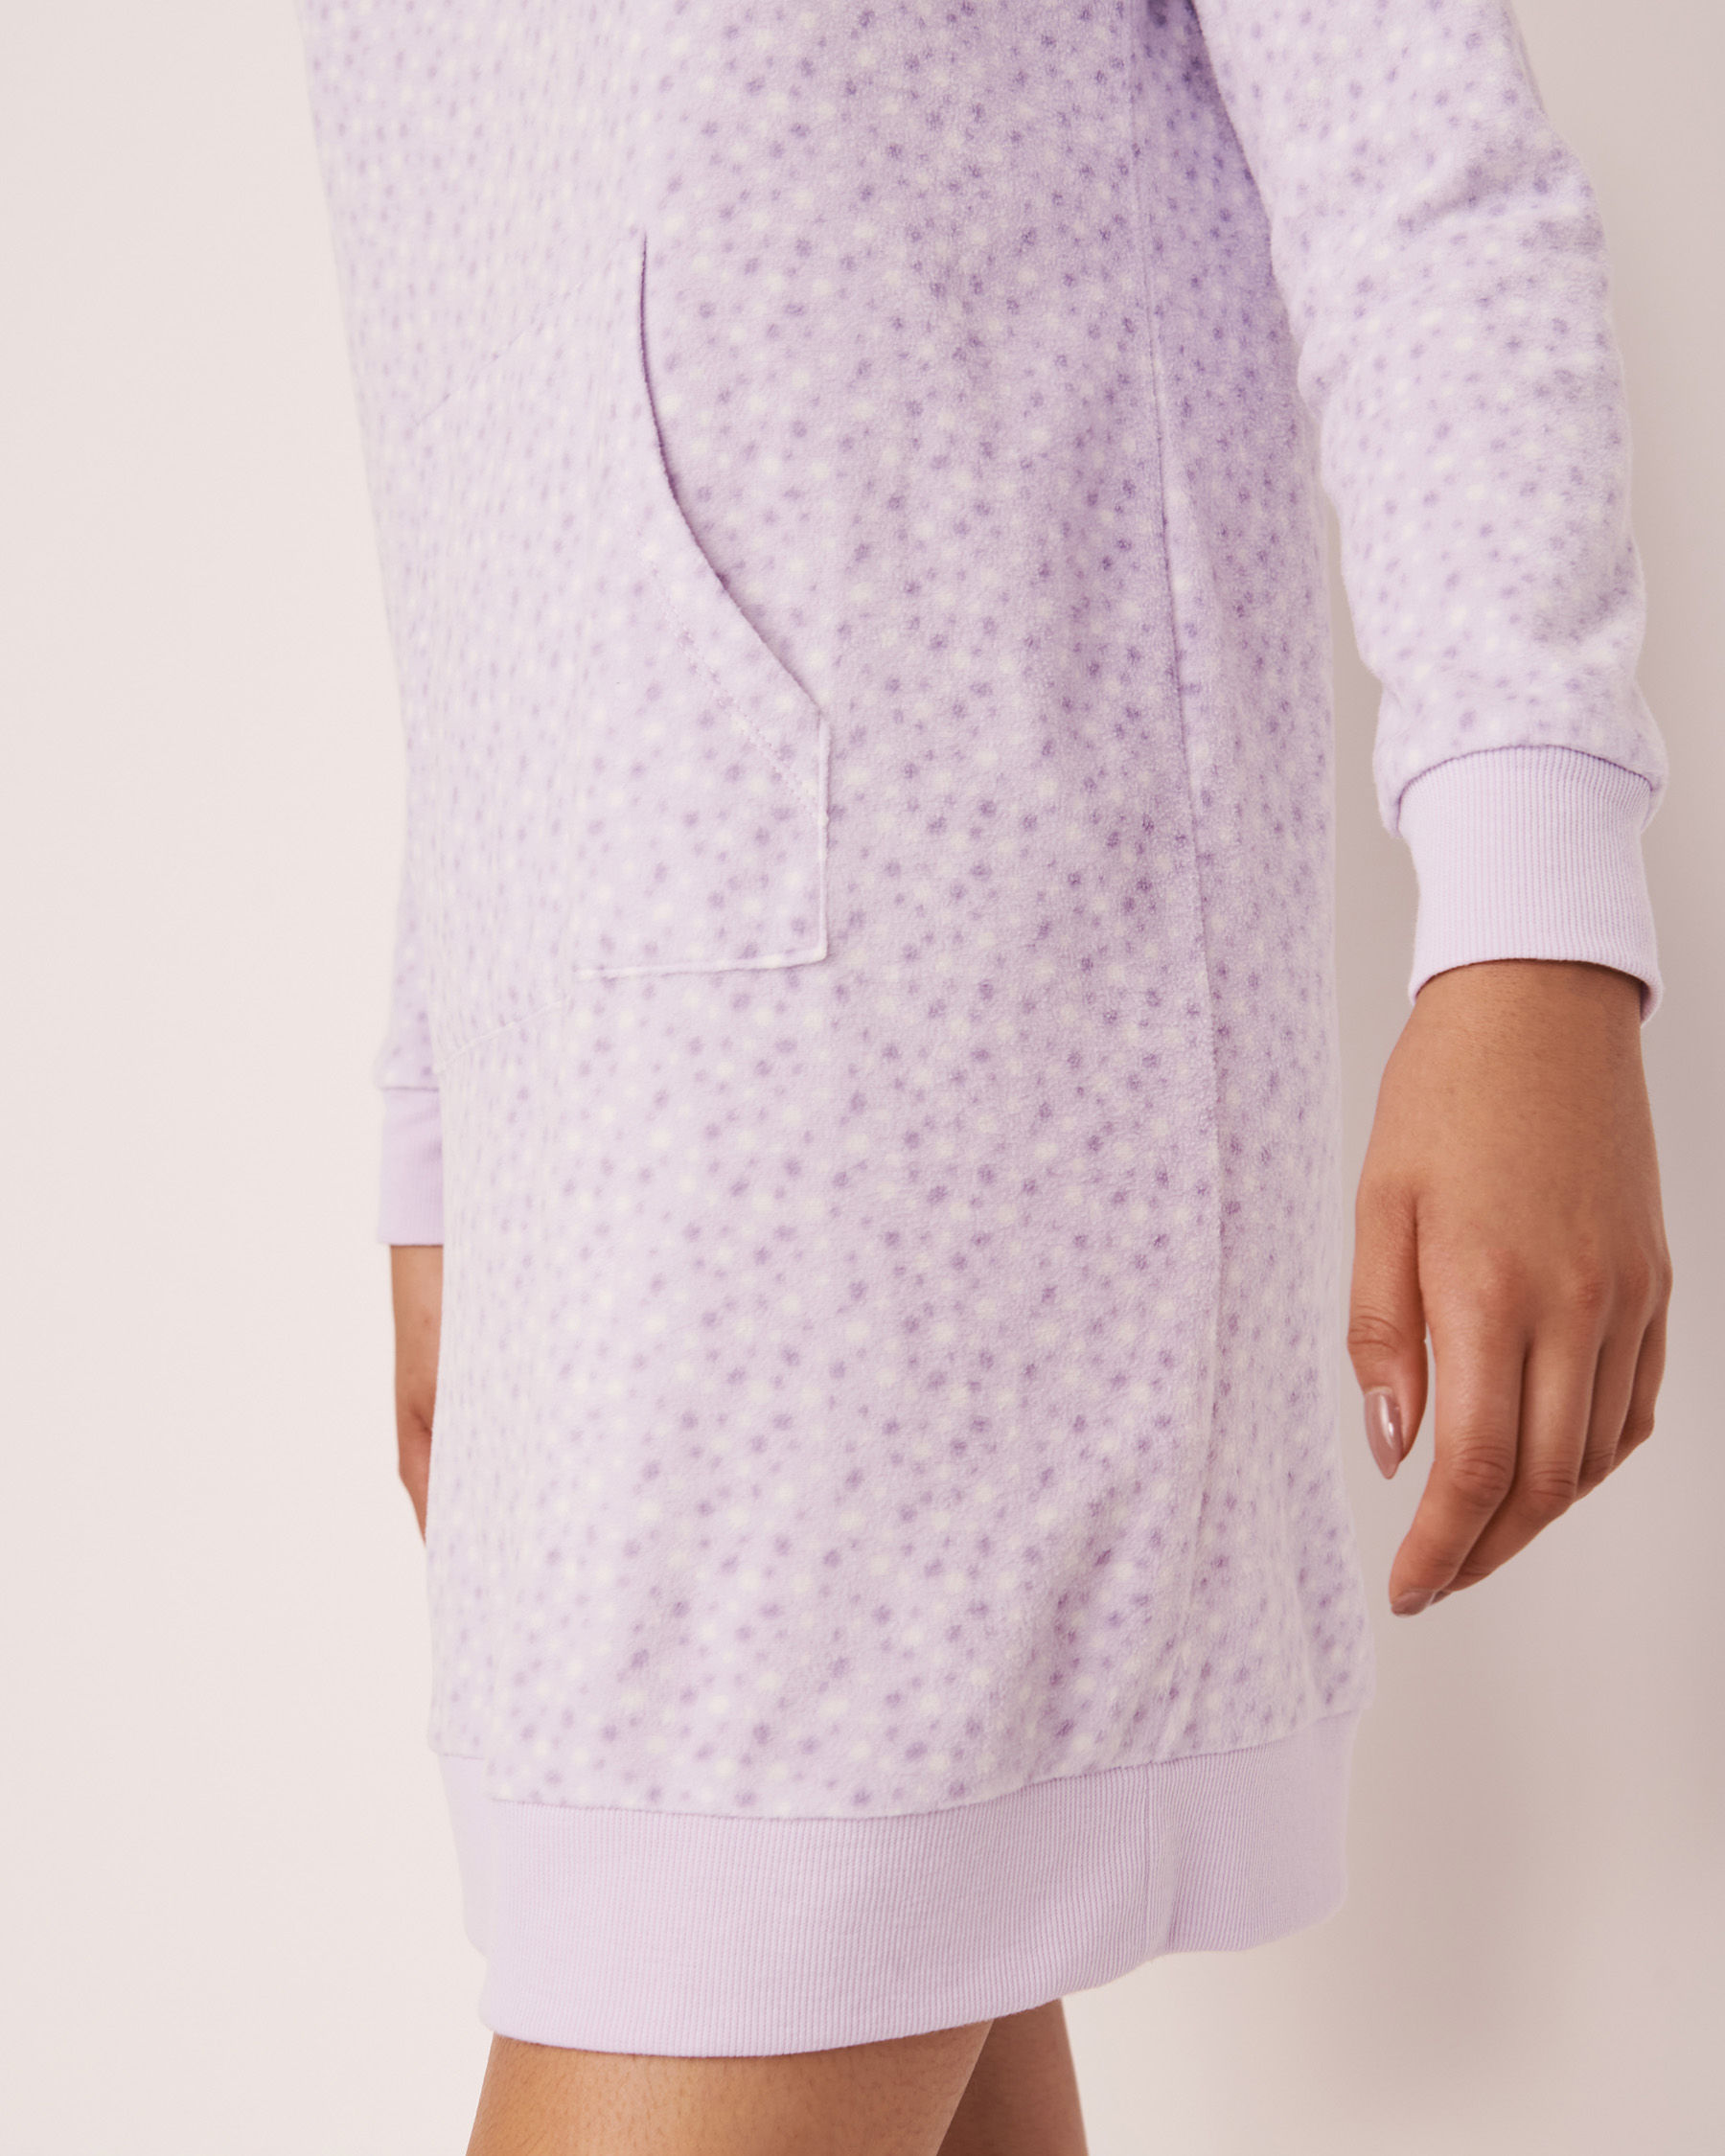 LA VIE EN ROSE Micropolar Long Sleeve Sleepshirt Multi dots 40500098 - View3